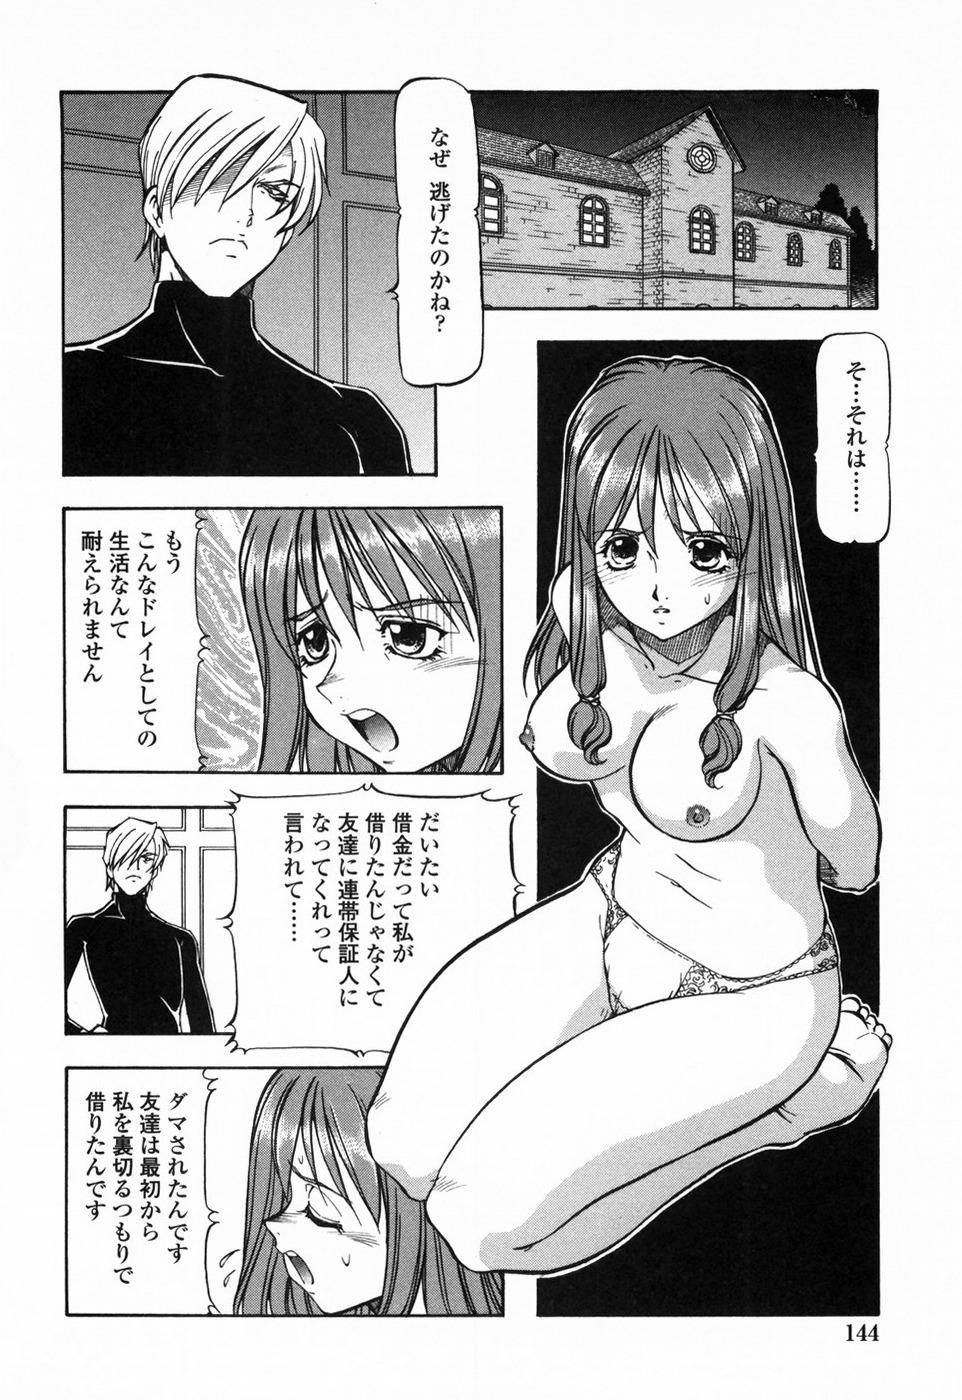 Kichiku Houteishiki - Equation of brutal person 150